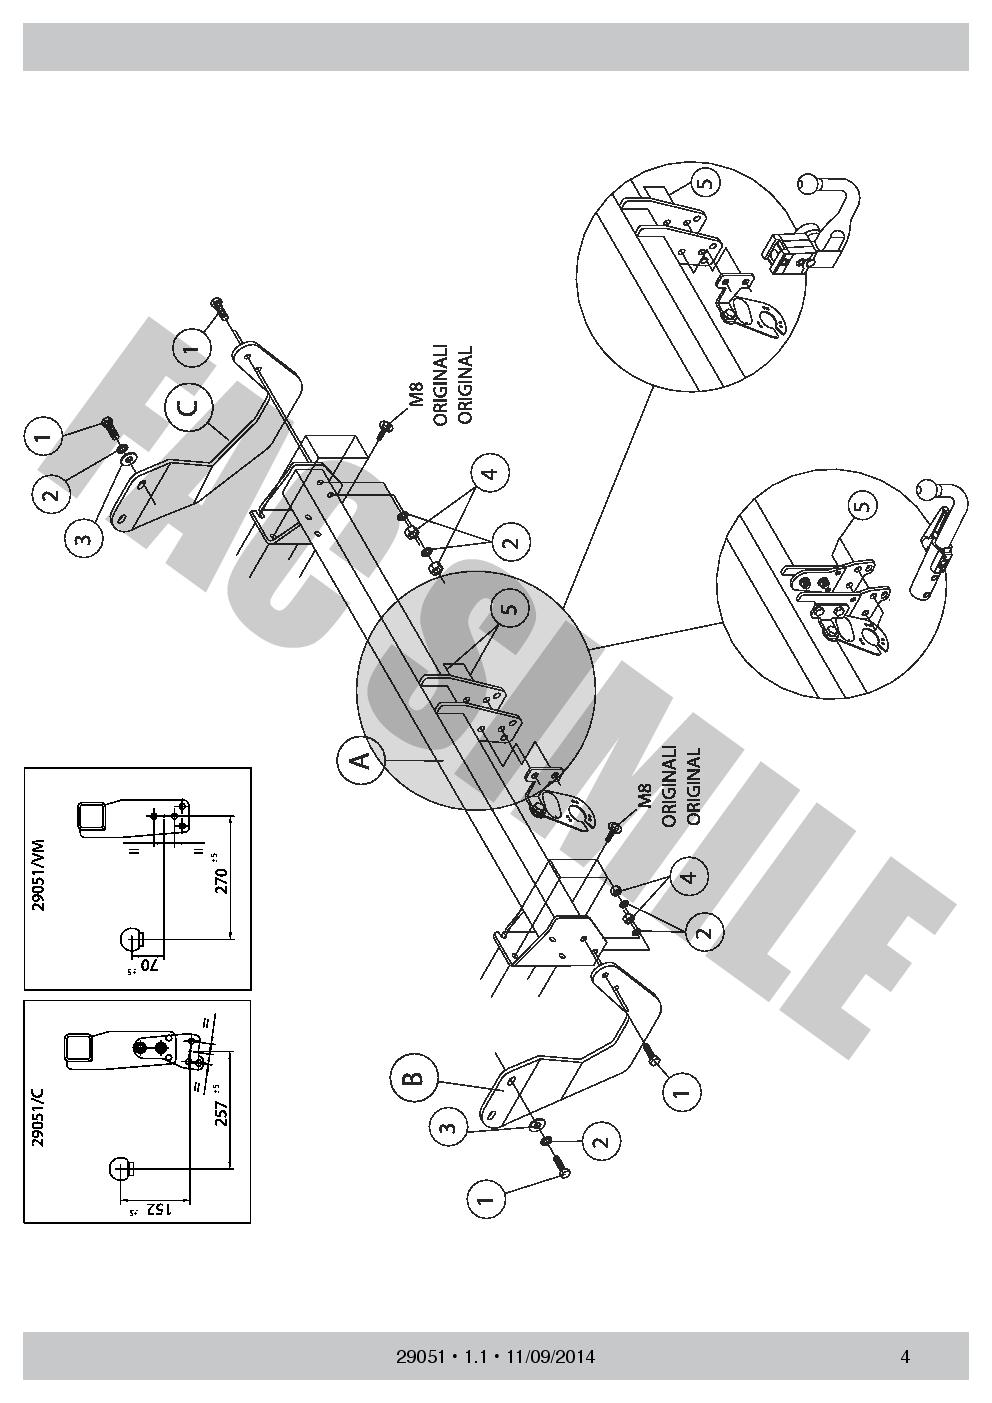 2905/_B1 AHK Vertikale Anhängerkupplung 7p C2 E-Satz Peugeot 508 Limo 2266 75 11